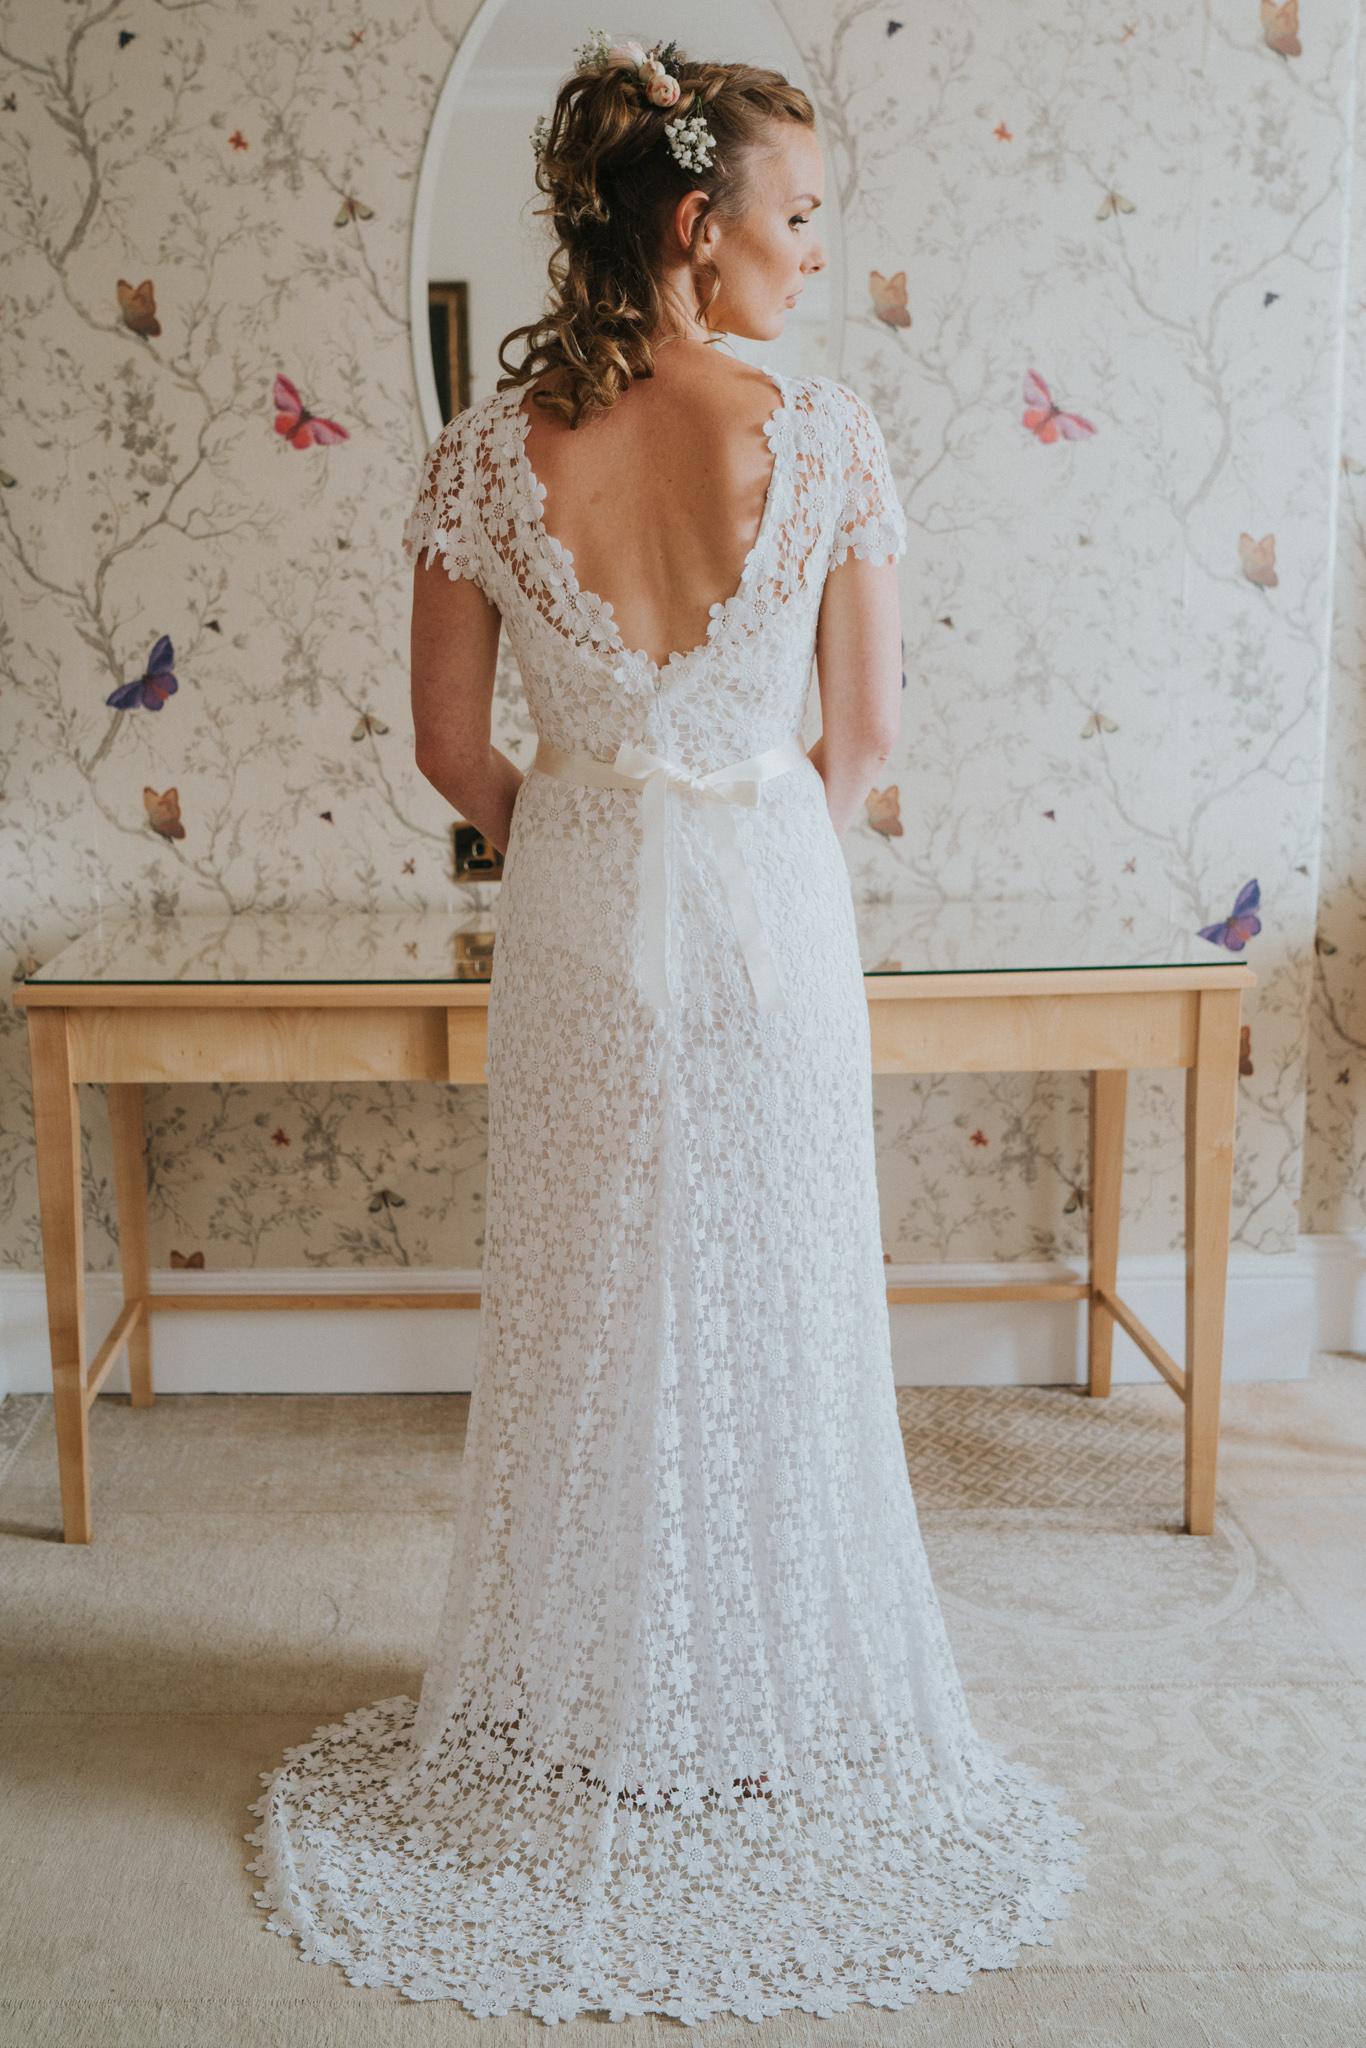 Grace-Elizabeth-Georgie-Amalaketu-Firstsite-Colchester-Essex-Boho-Buddhist-Wedding-Alternative-Wedding-Photography-Essex (29 of 100).jpg